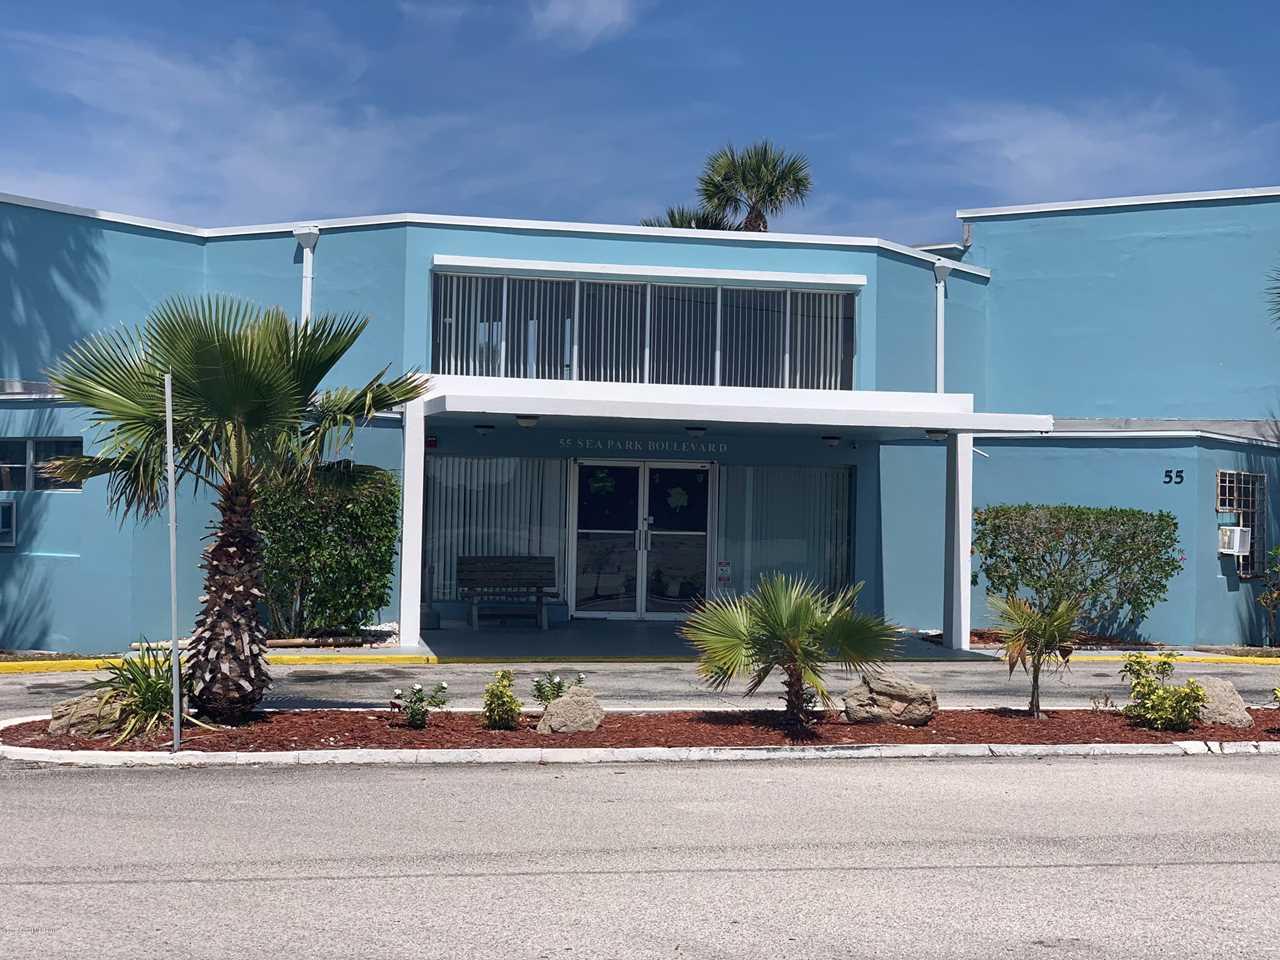 55 Sea Park Boulevard #410 Satellite Beach, FL 32937 | MLS 839652 Photo 1